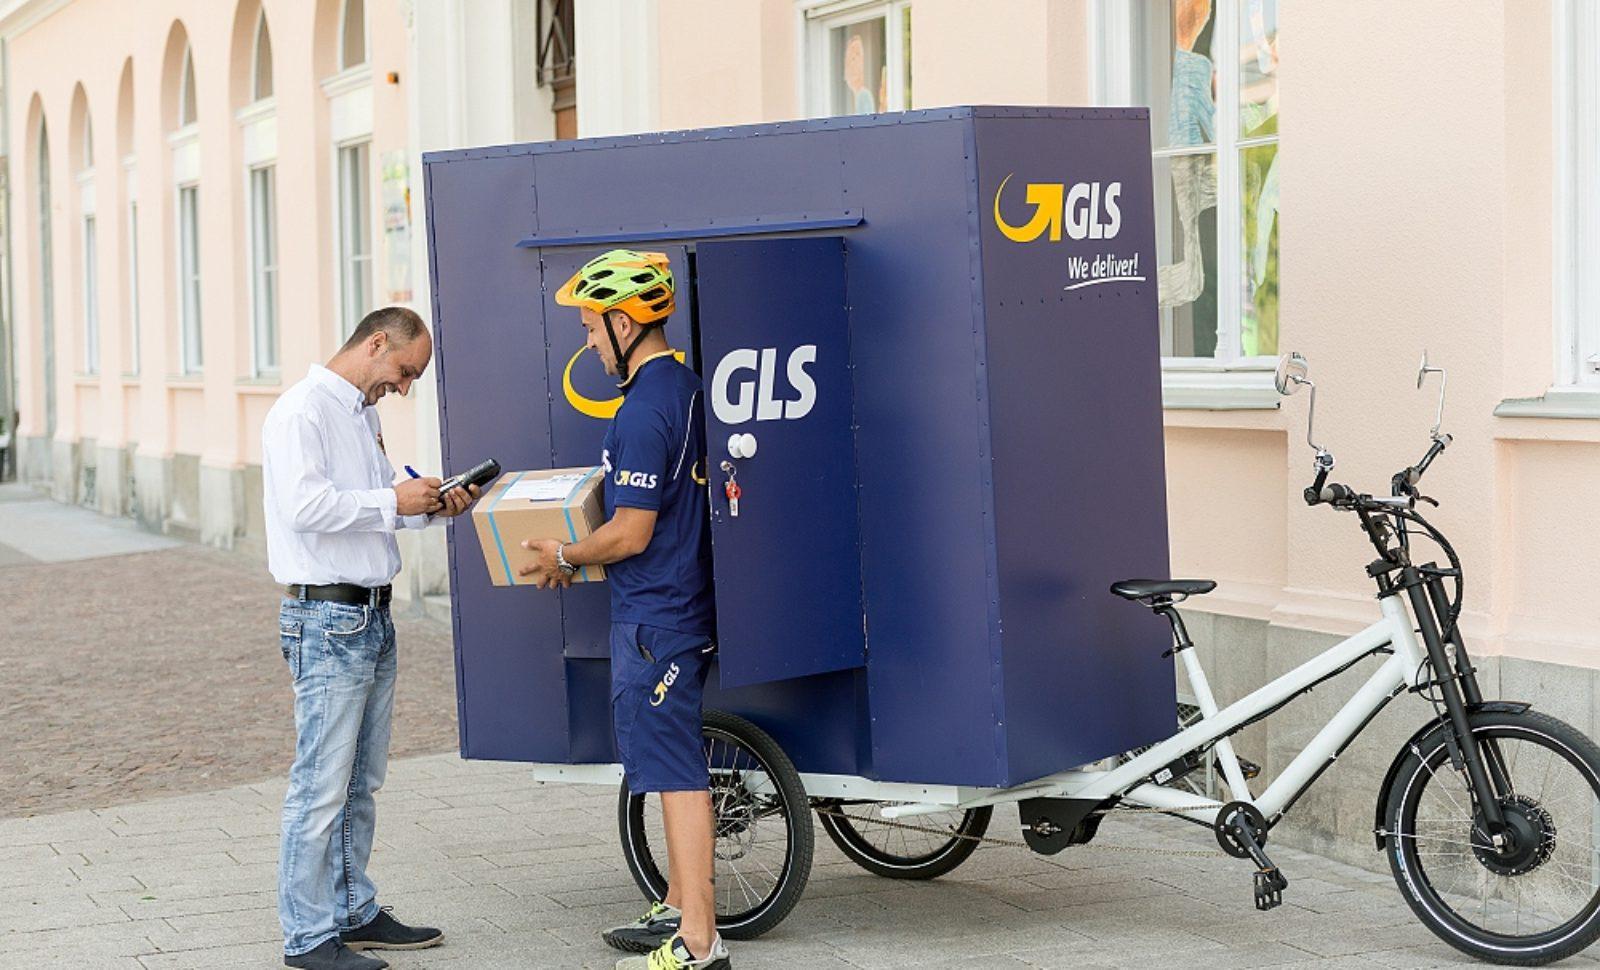 gls austria liefert pakete per fahrrad logistik express news. Black Bedroom Furniture Sets. Home Design Ideas